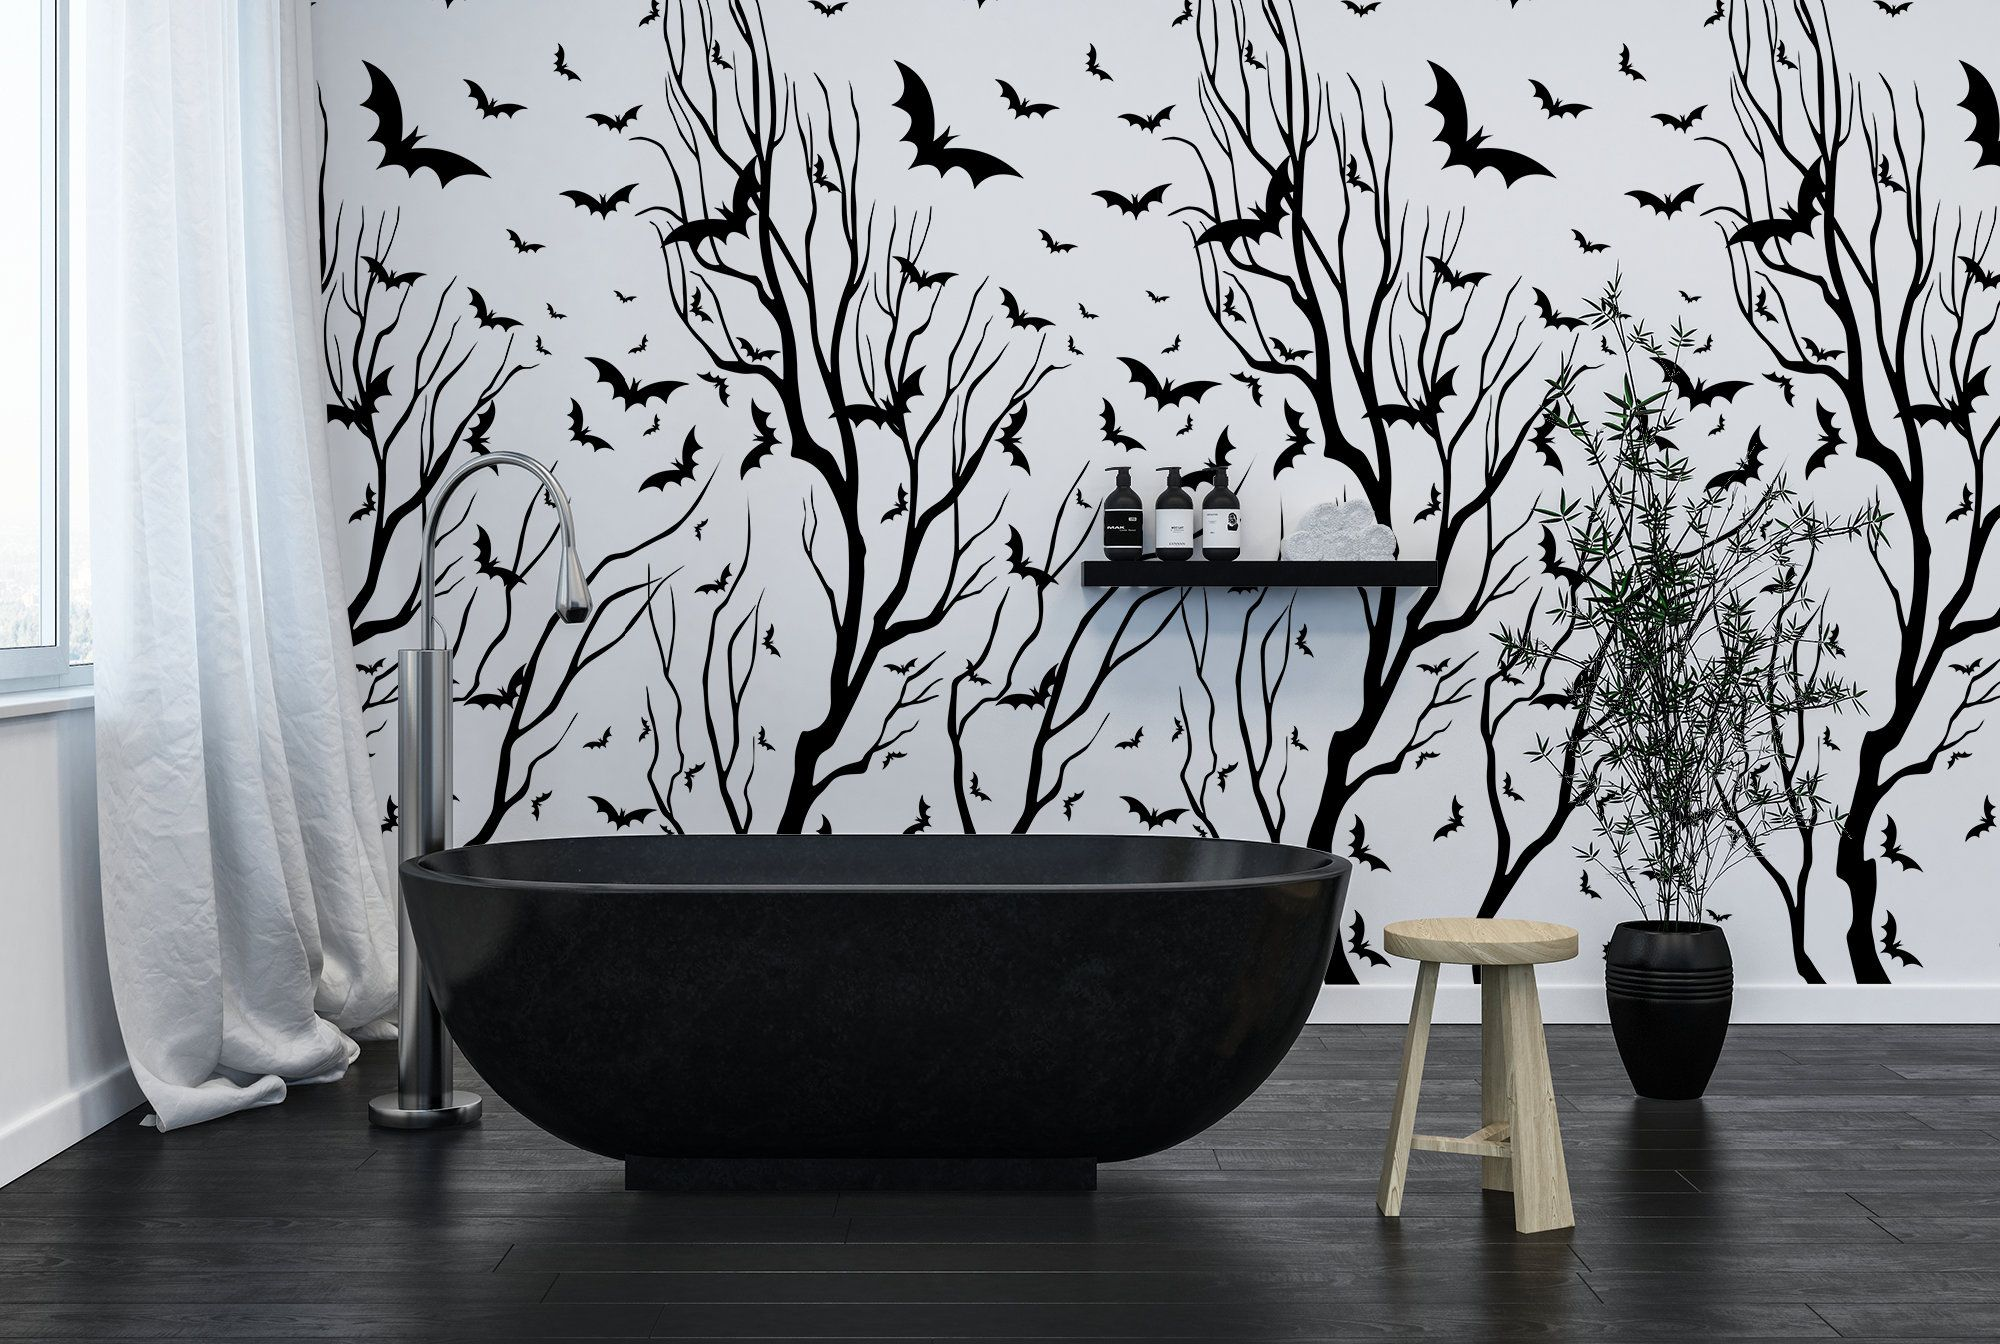 Black And White Trees Wall Mural Self Adhesive Wallpaper Etsy Tree Wall Murals Bird Wall Decor Minimalist Wall Stickers